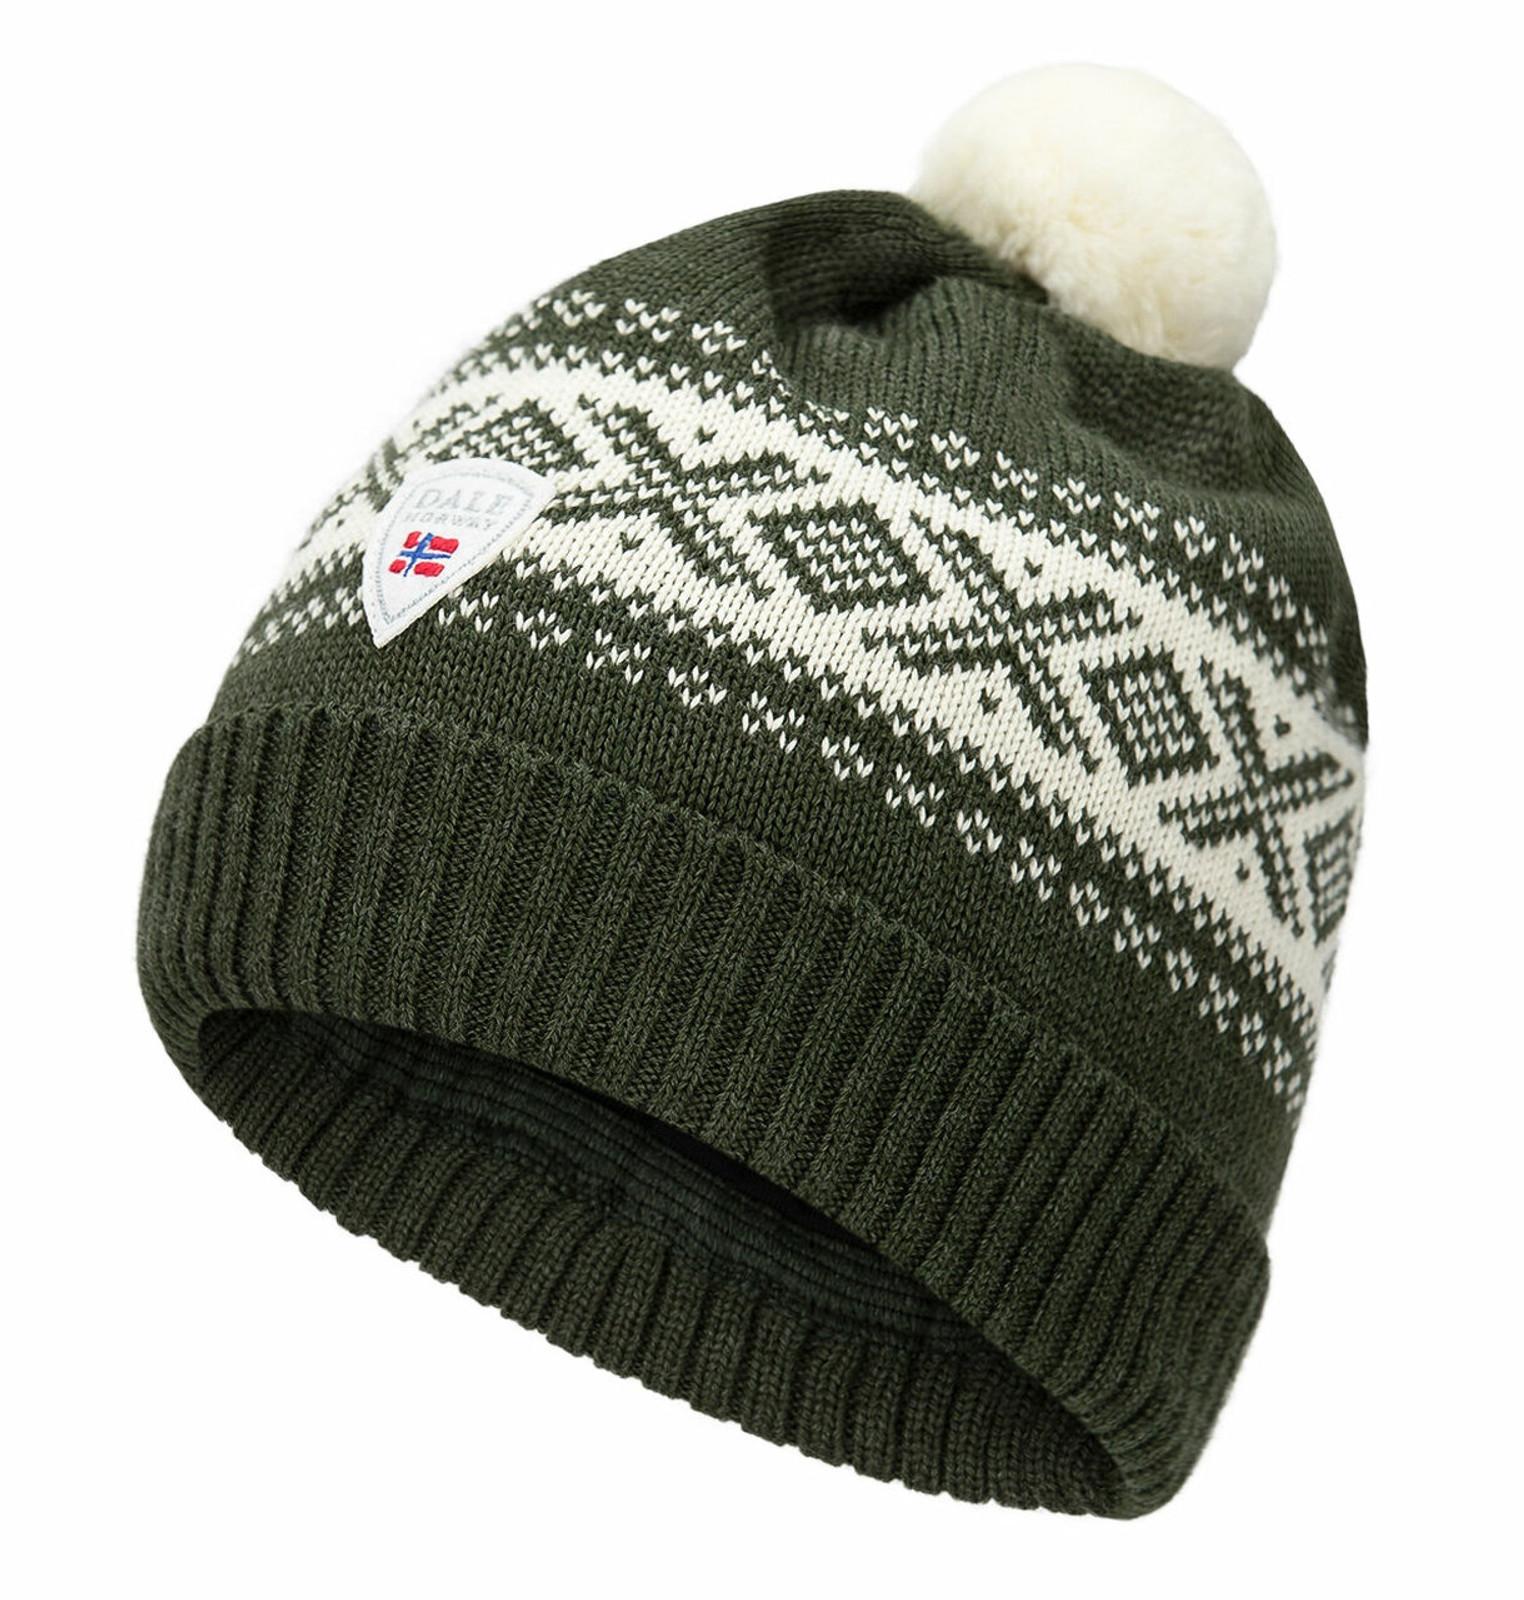 Dale of Norway Cortina Kids Hat 4-8, Dark Green/Off White, 43341-G